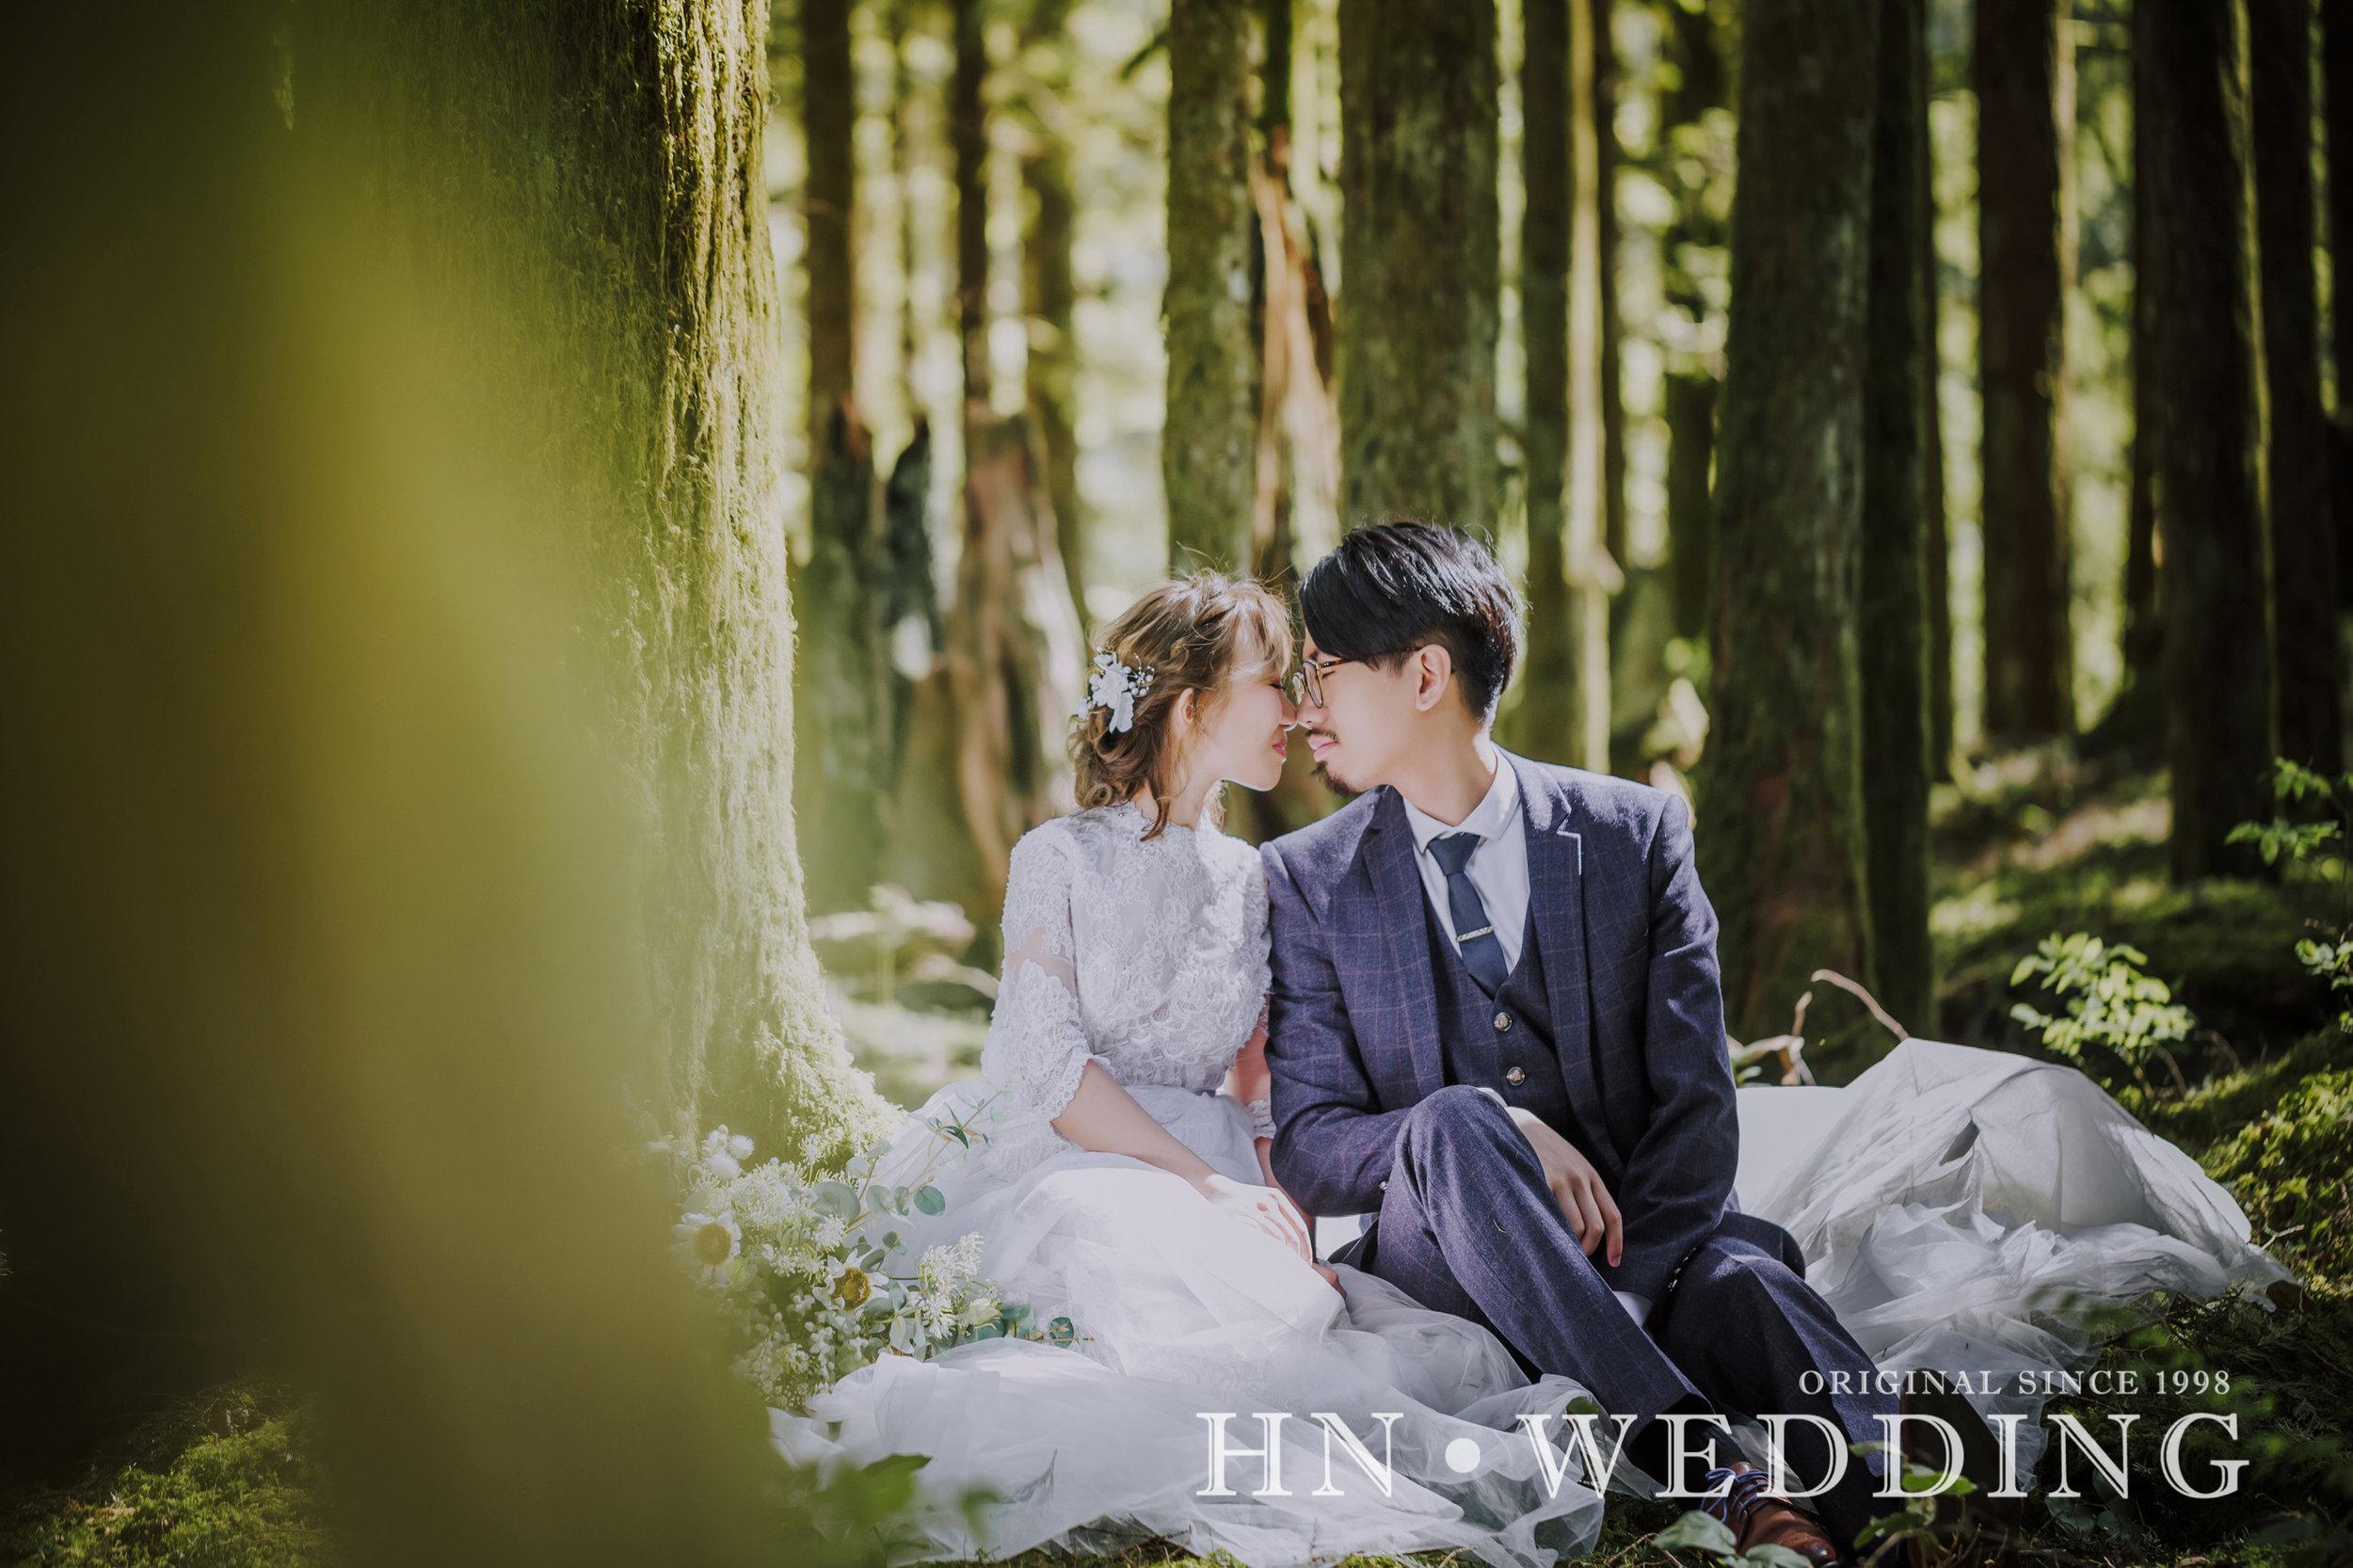 hnweddingweddingdayA&R-11.jpg